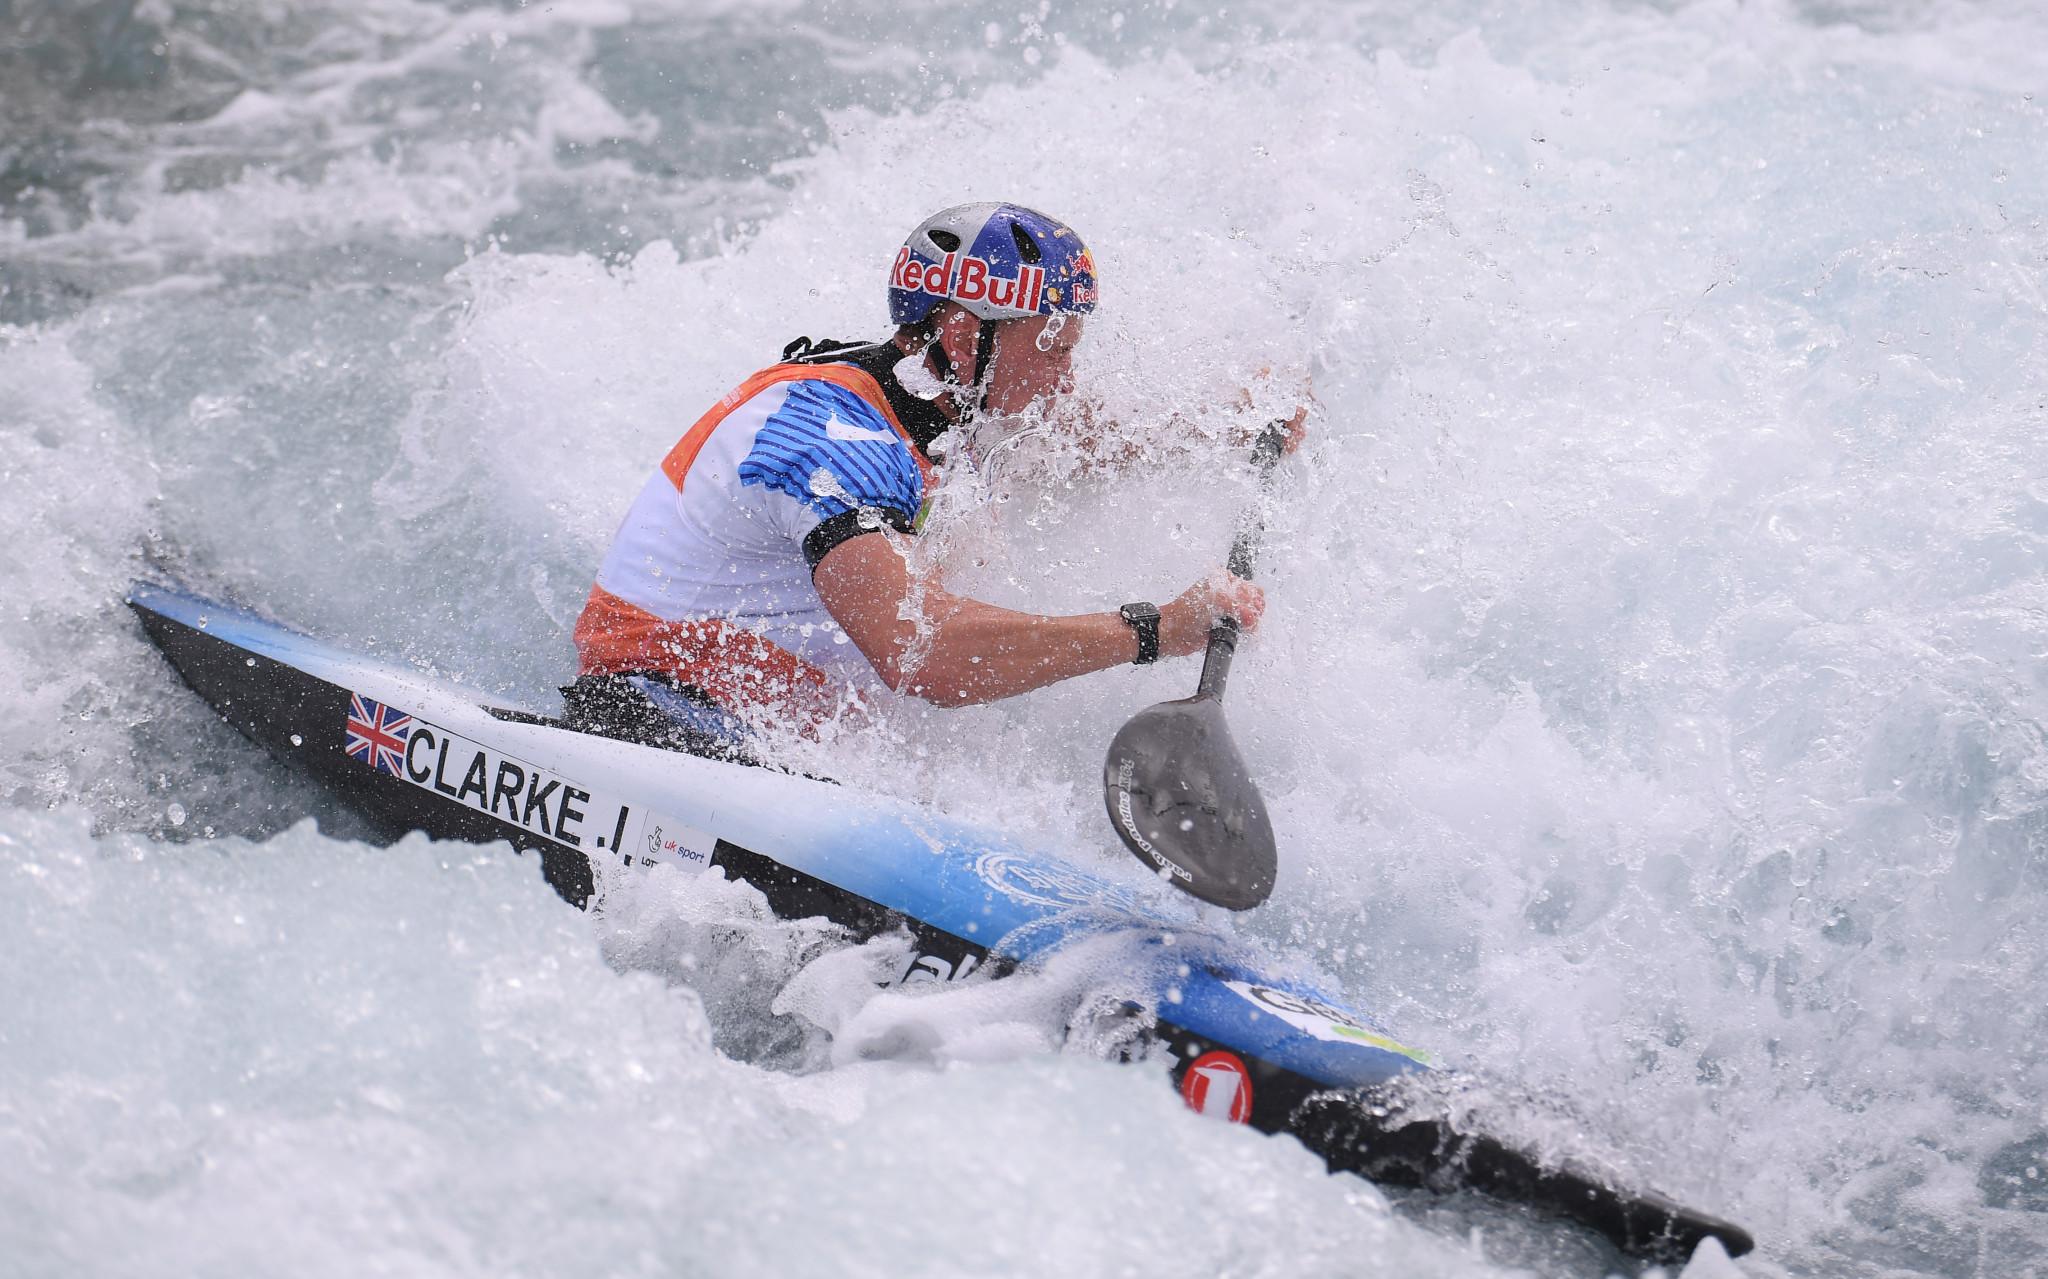 Clarke and Fox star as ICF Canoe Slalom World Cup opens in Ljubljana